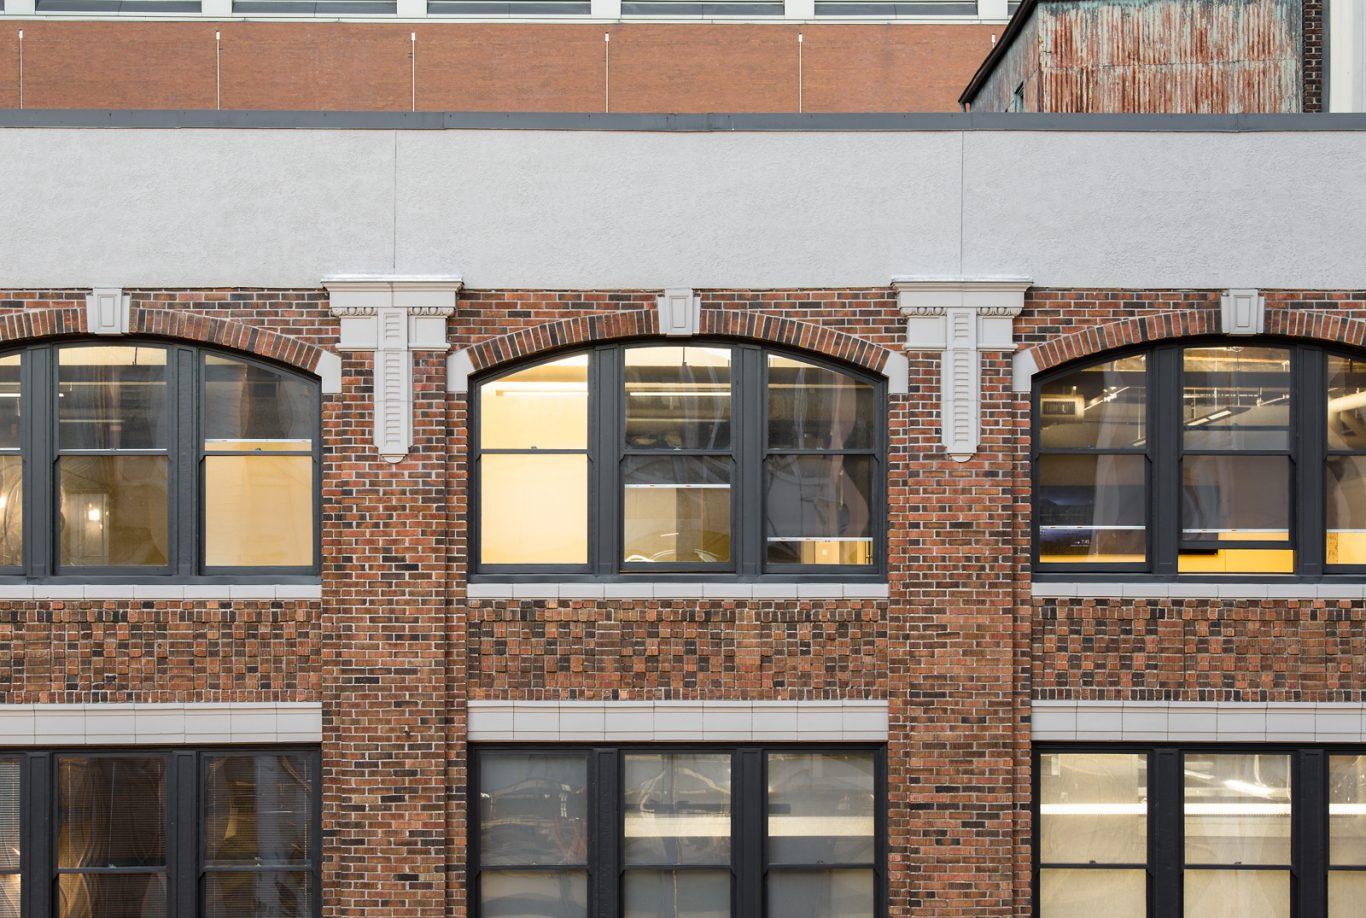 Ornamental details on exterior of a brick building